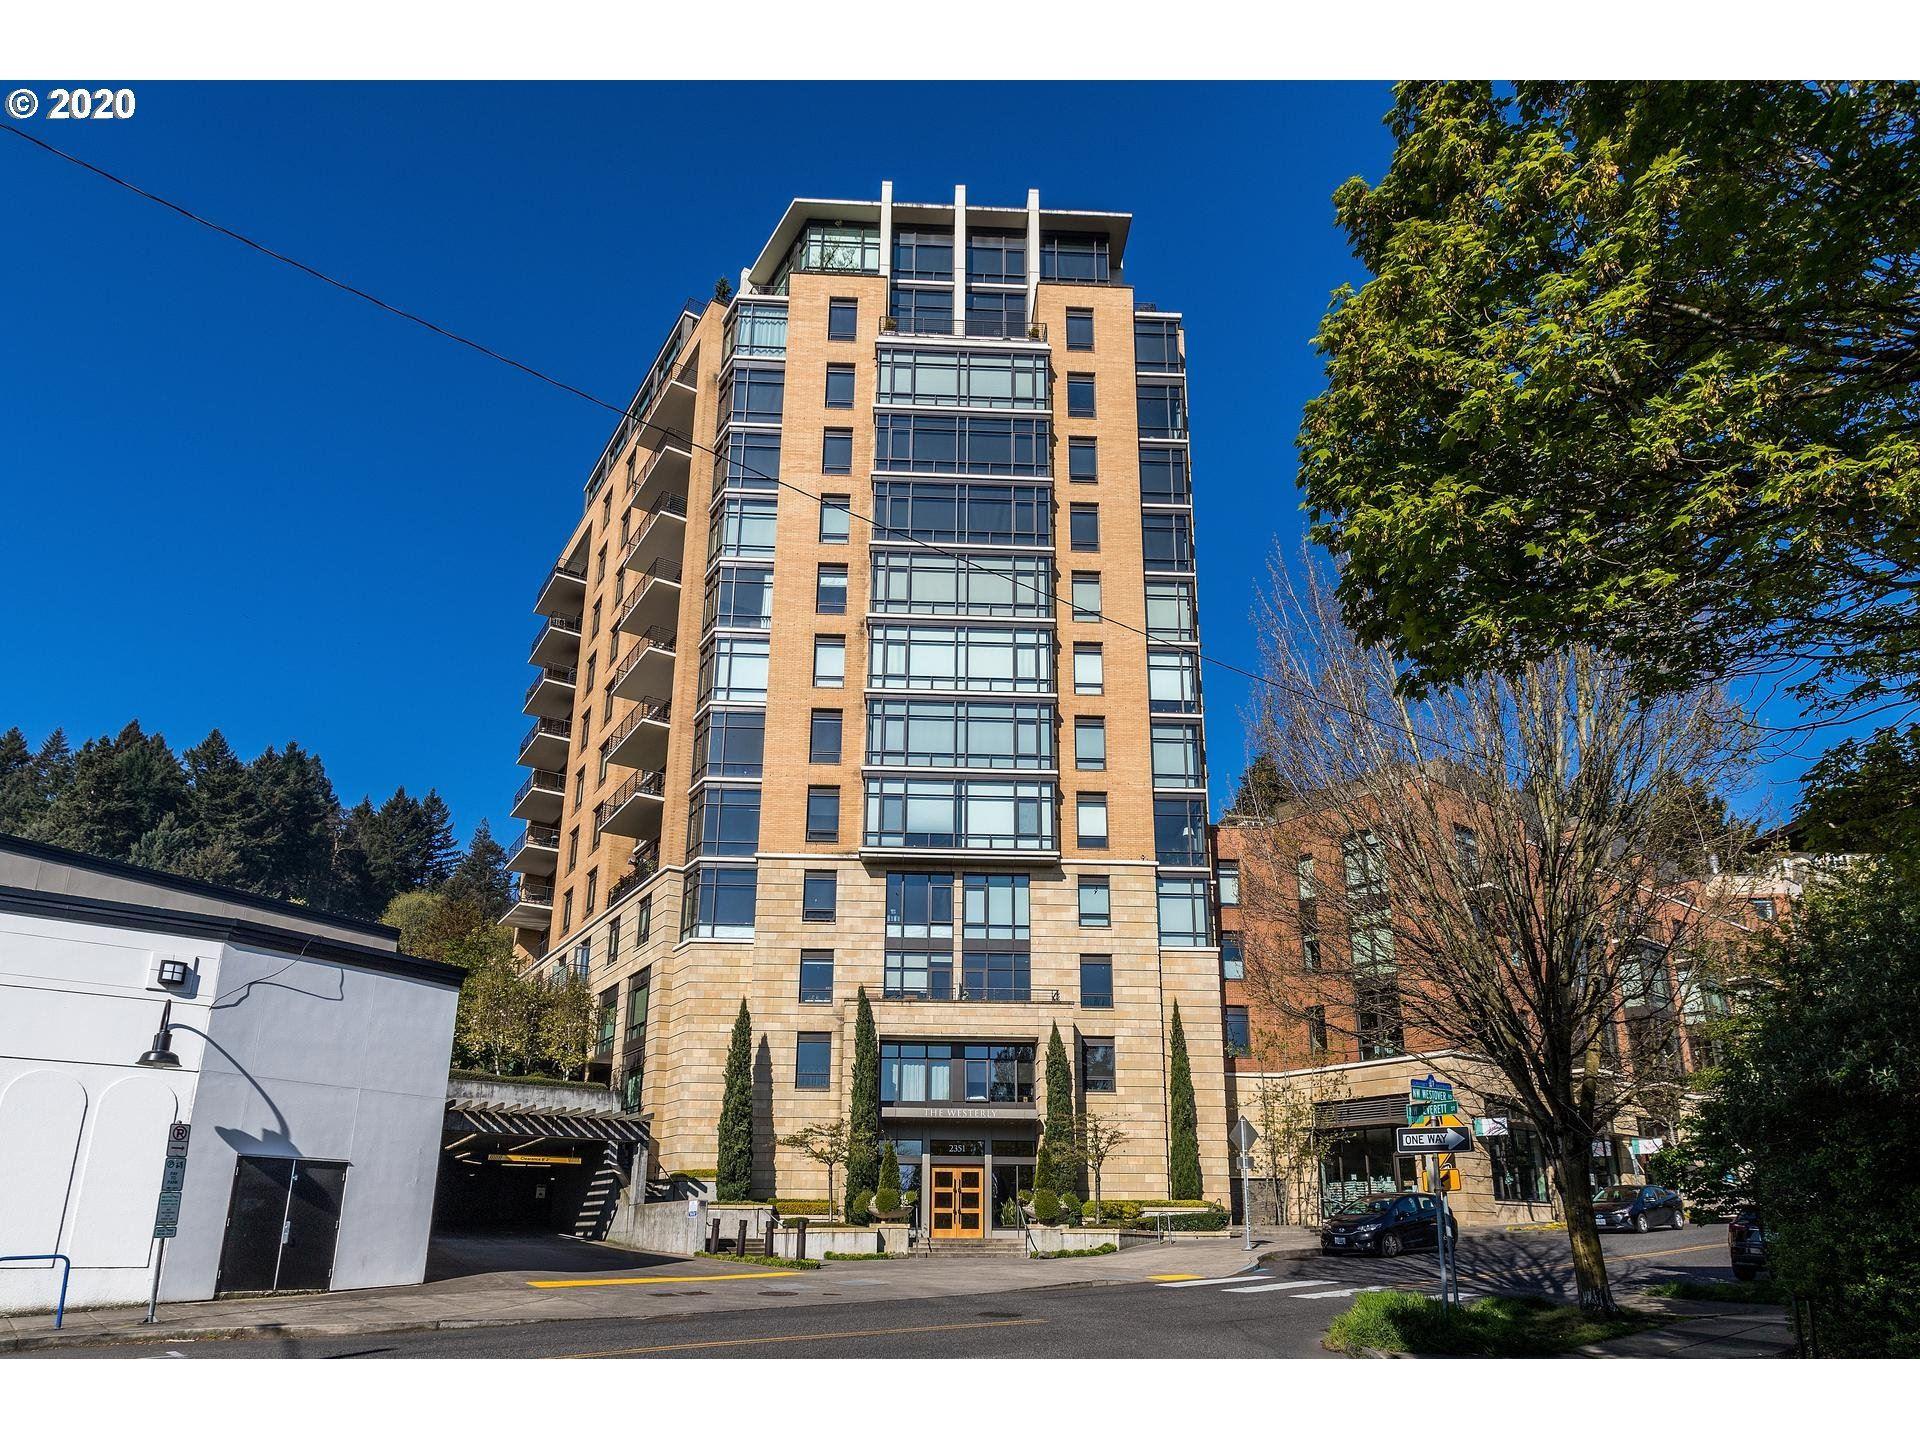 2351 NW WESTOVER RD #307, Portland, OR 97210 - MLS#: 20347328